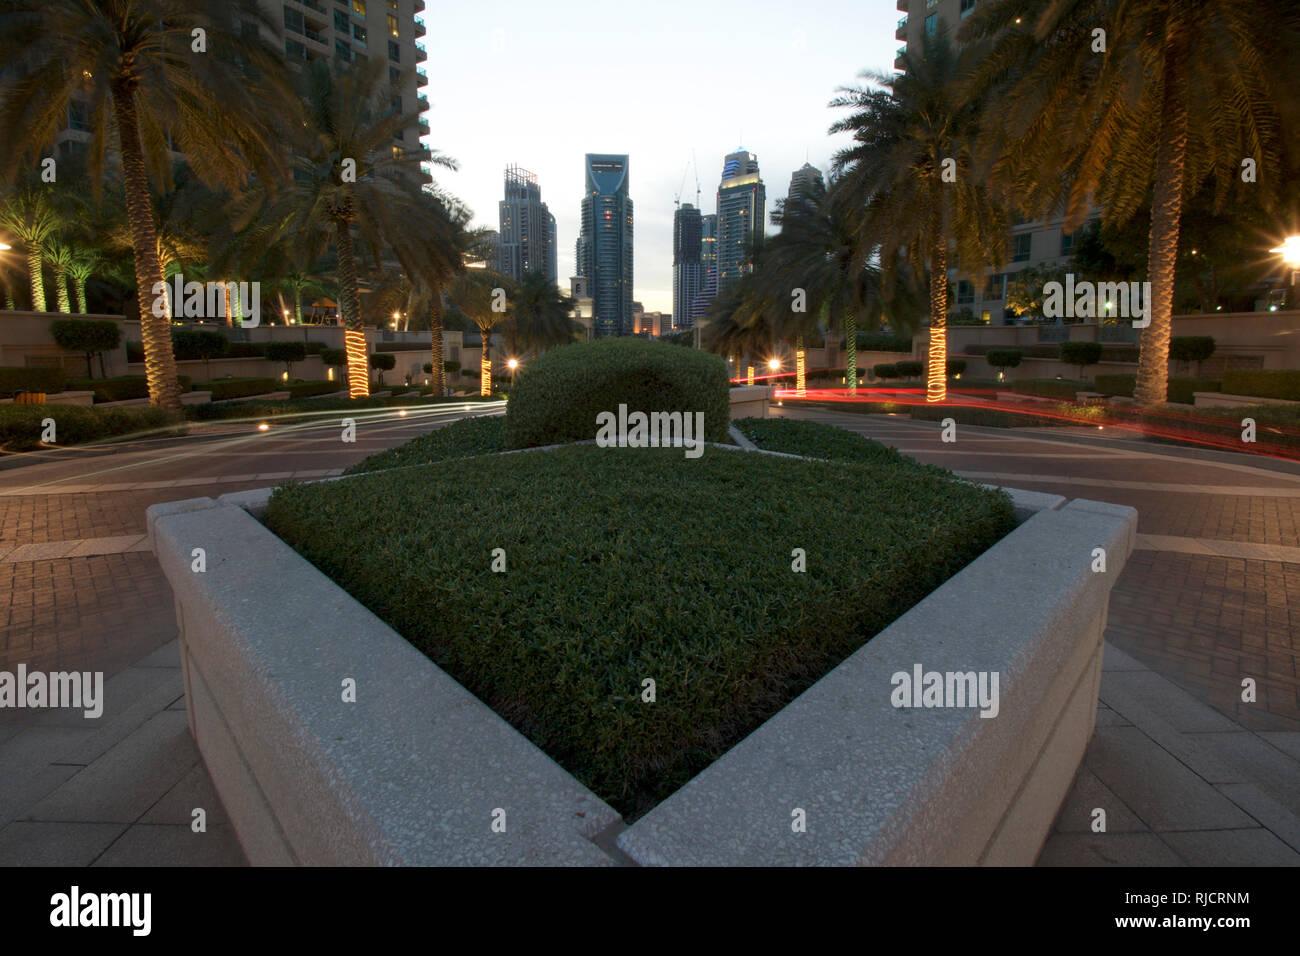 Marina Dubai-Entrance caminando hacia el atardecer 2 Imagen De Stock